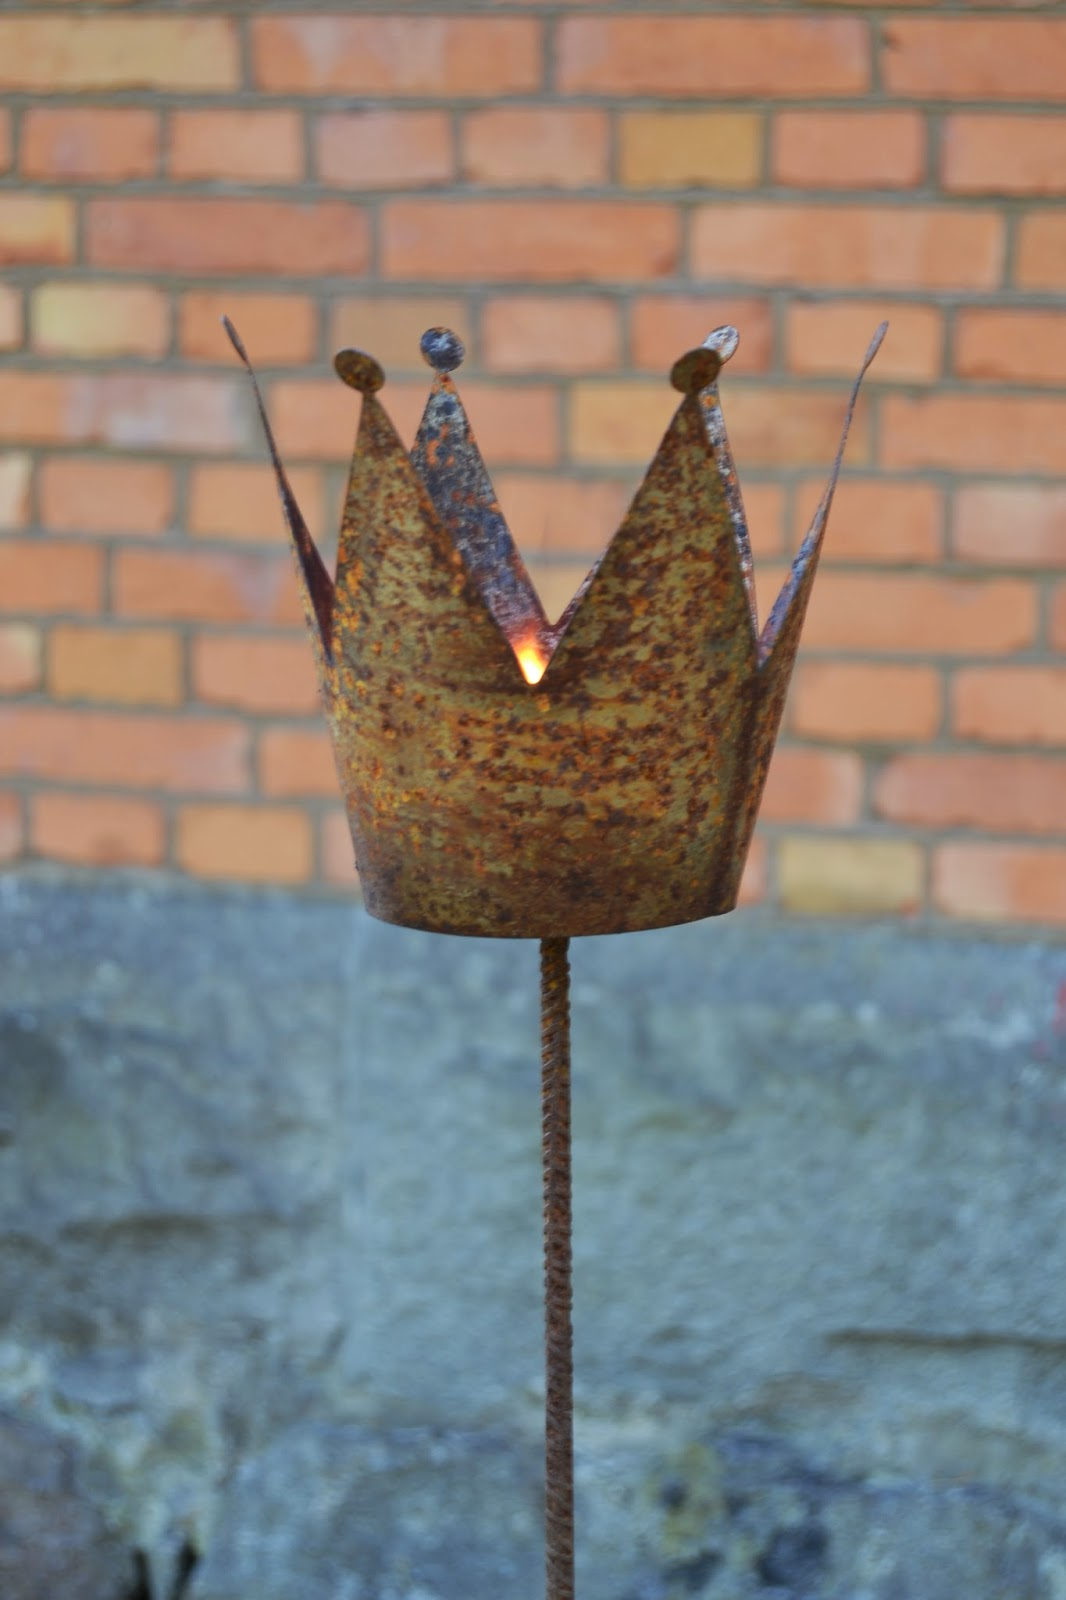 marschallhållare, marschallhållare höga, marschallhållare krona, snygga marschallhållare